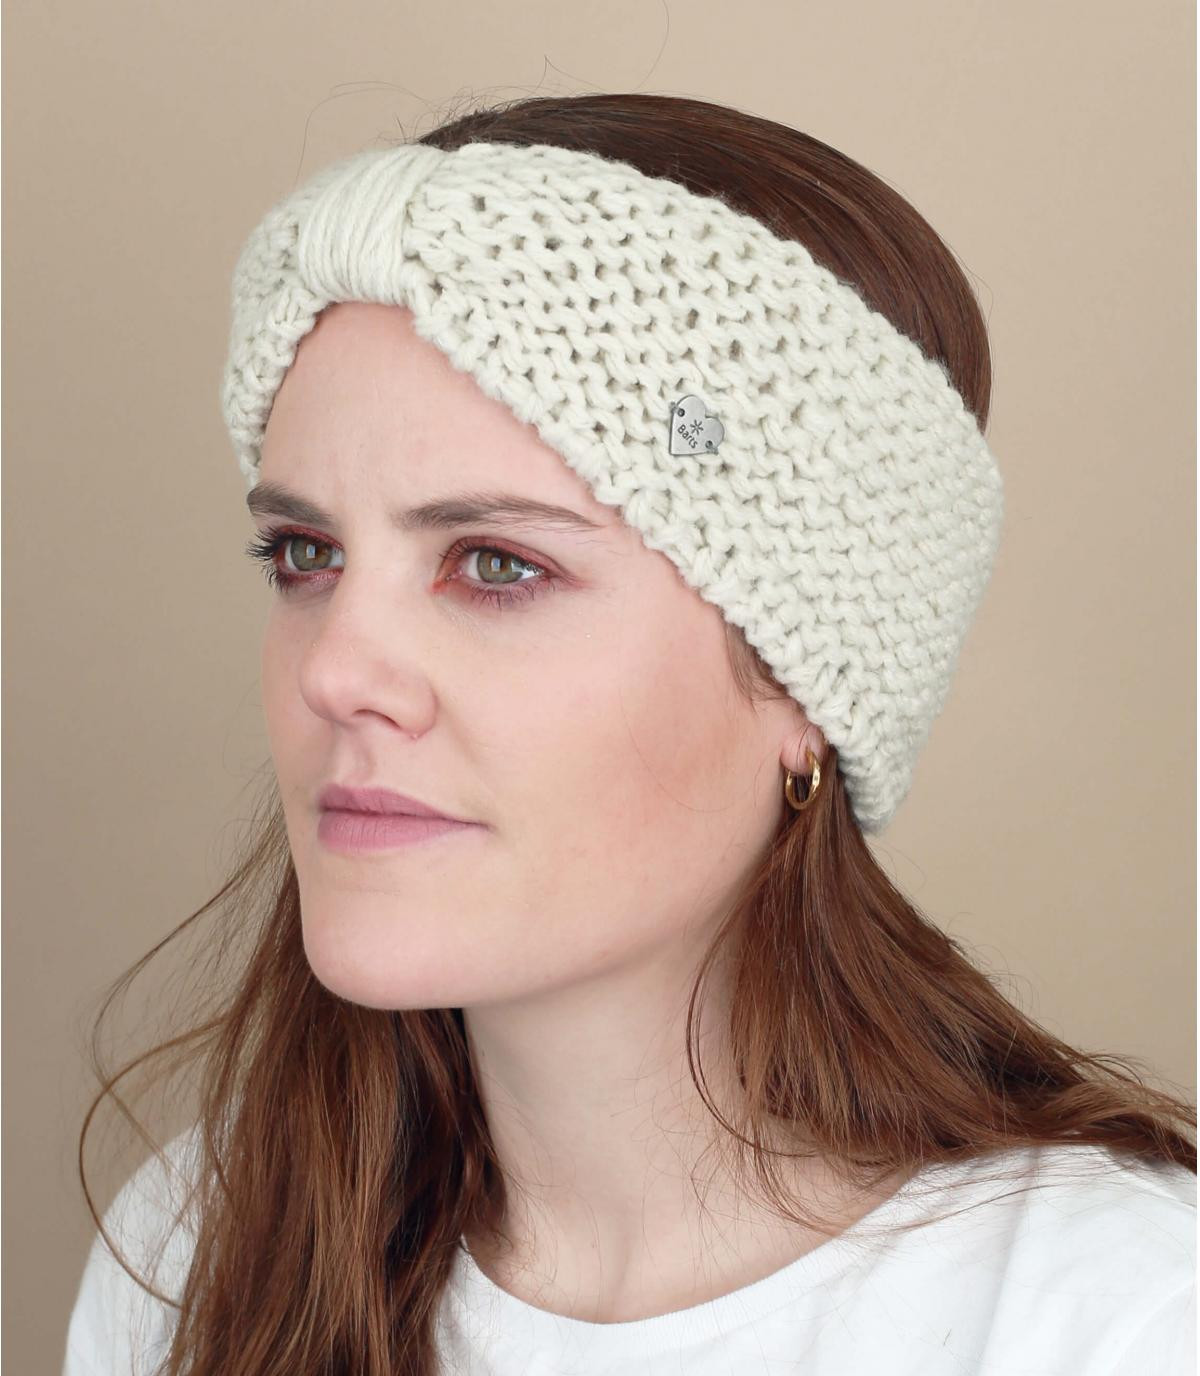 Witte hoofdband bow winter